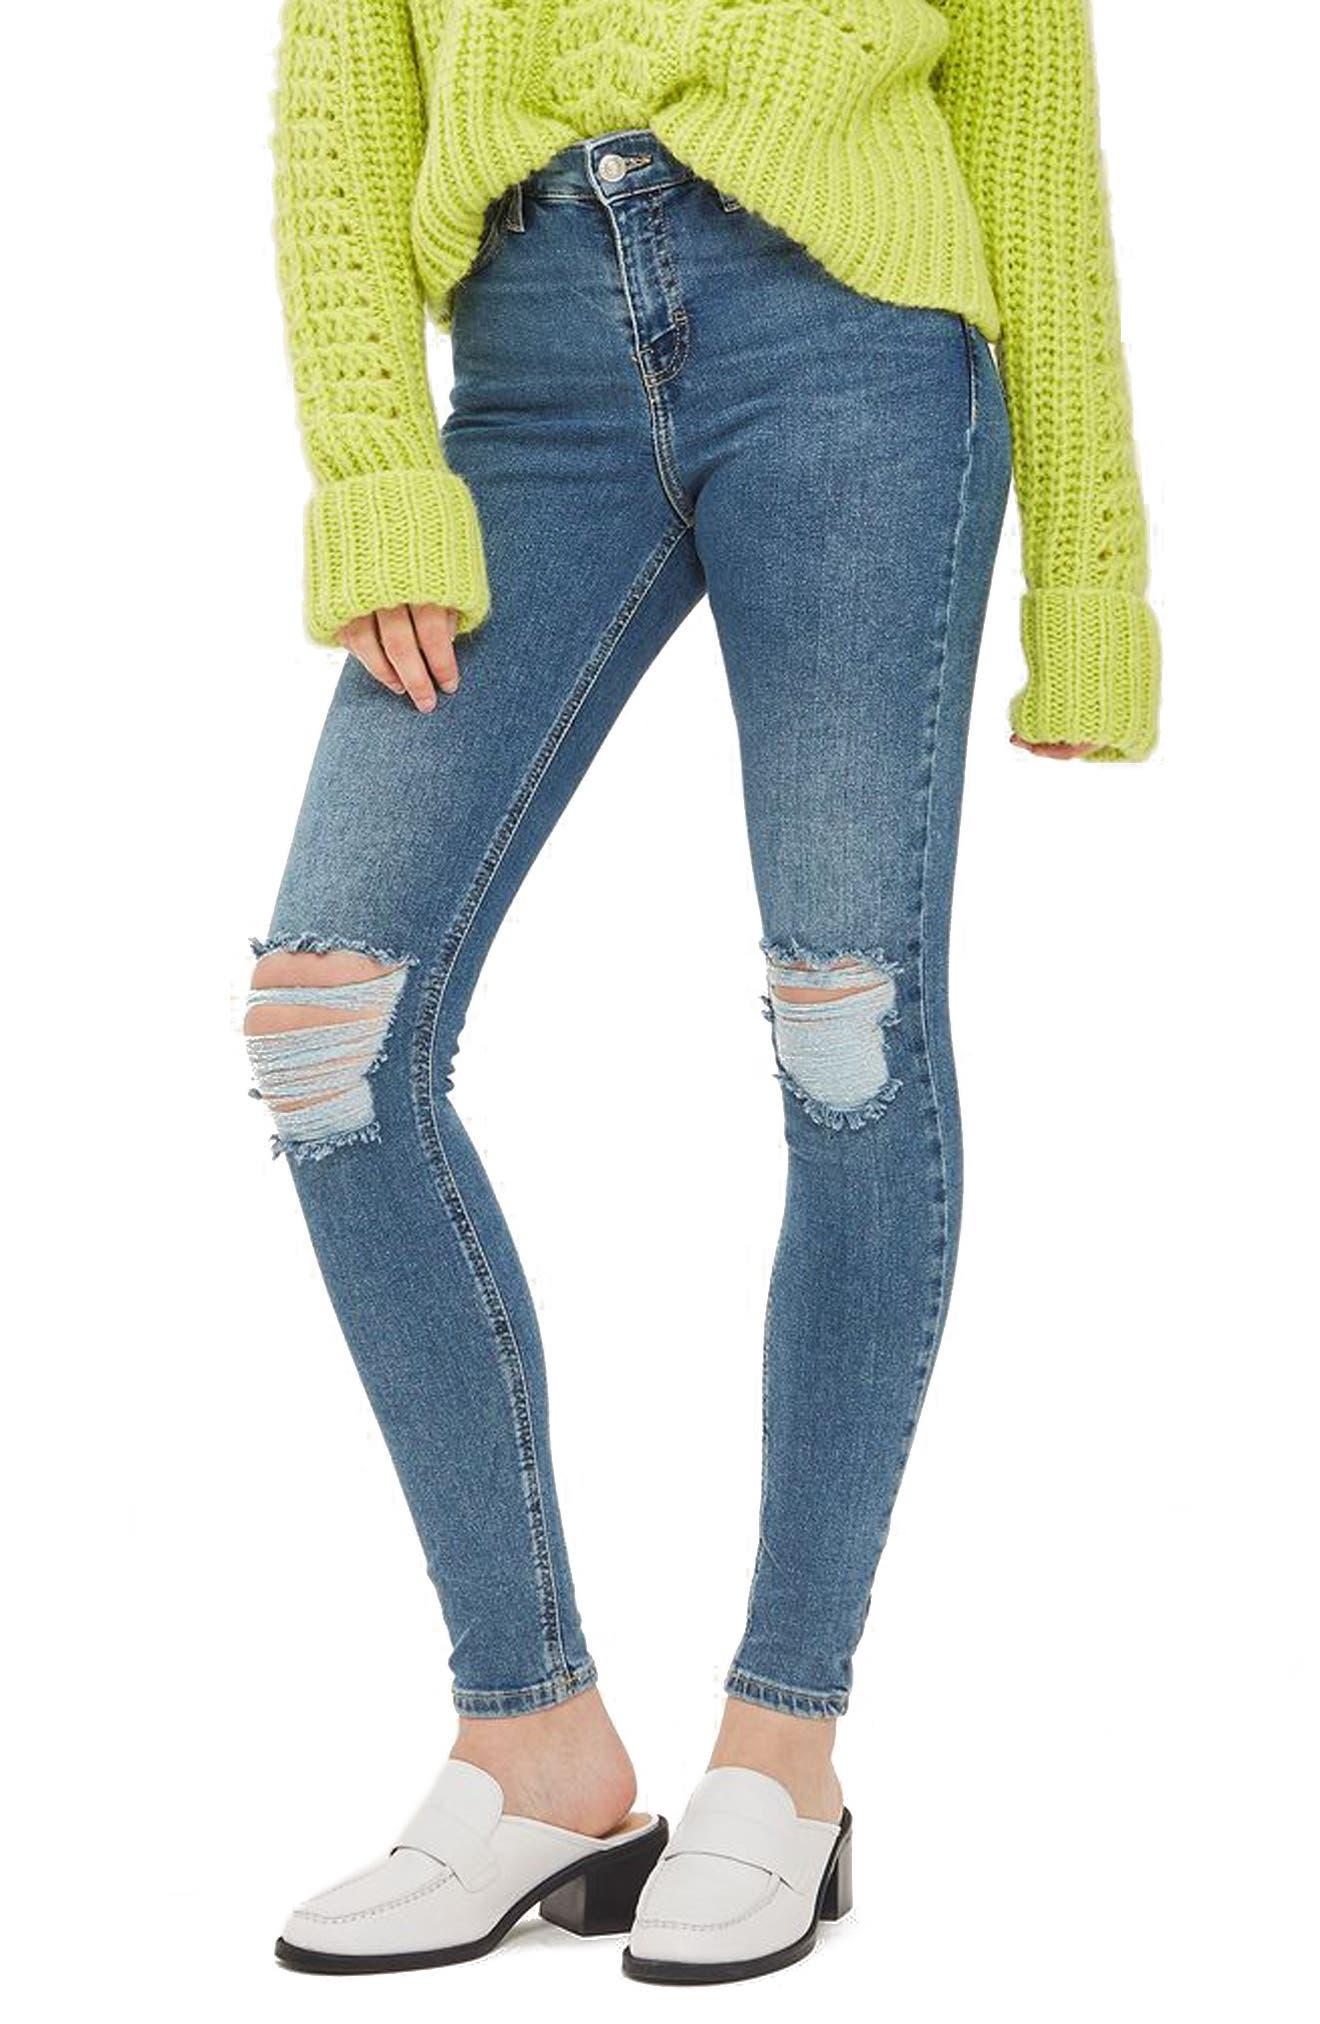 Jamie Rip High Waist Skinny Jeans,                             Main thumbnail 1, color,                             400